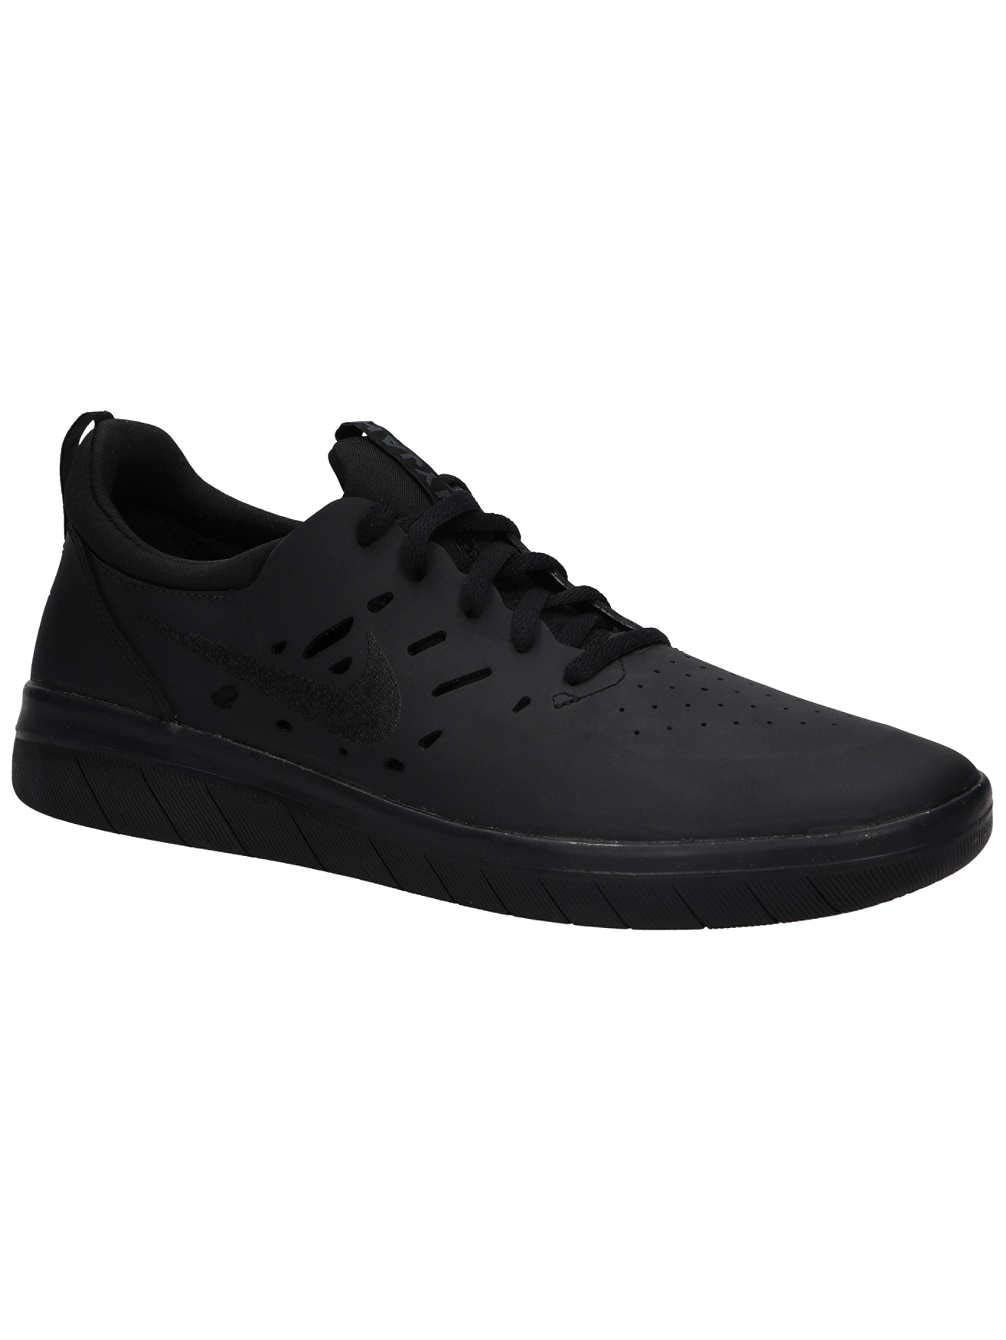 brand new 93ebb f6ffc Galleon - Nike Sb Nyjah Free Mens Aa4272-003 Size 9 Black Black-Black